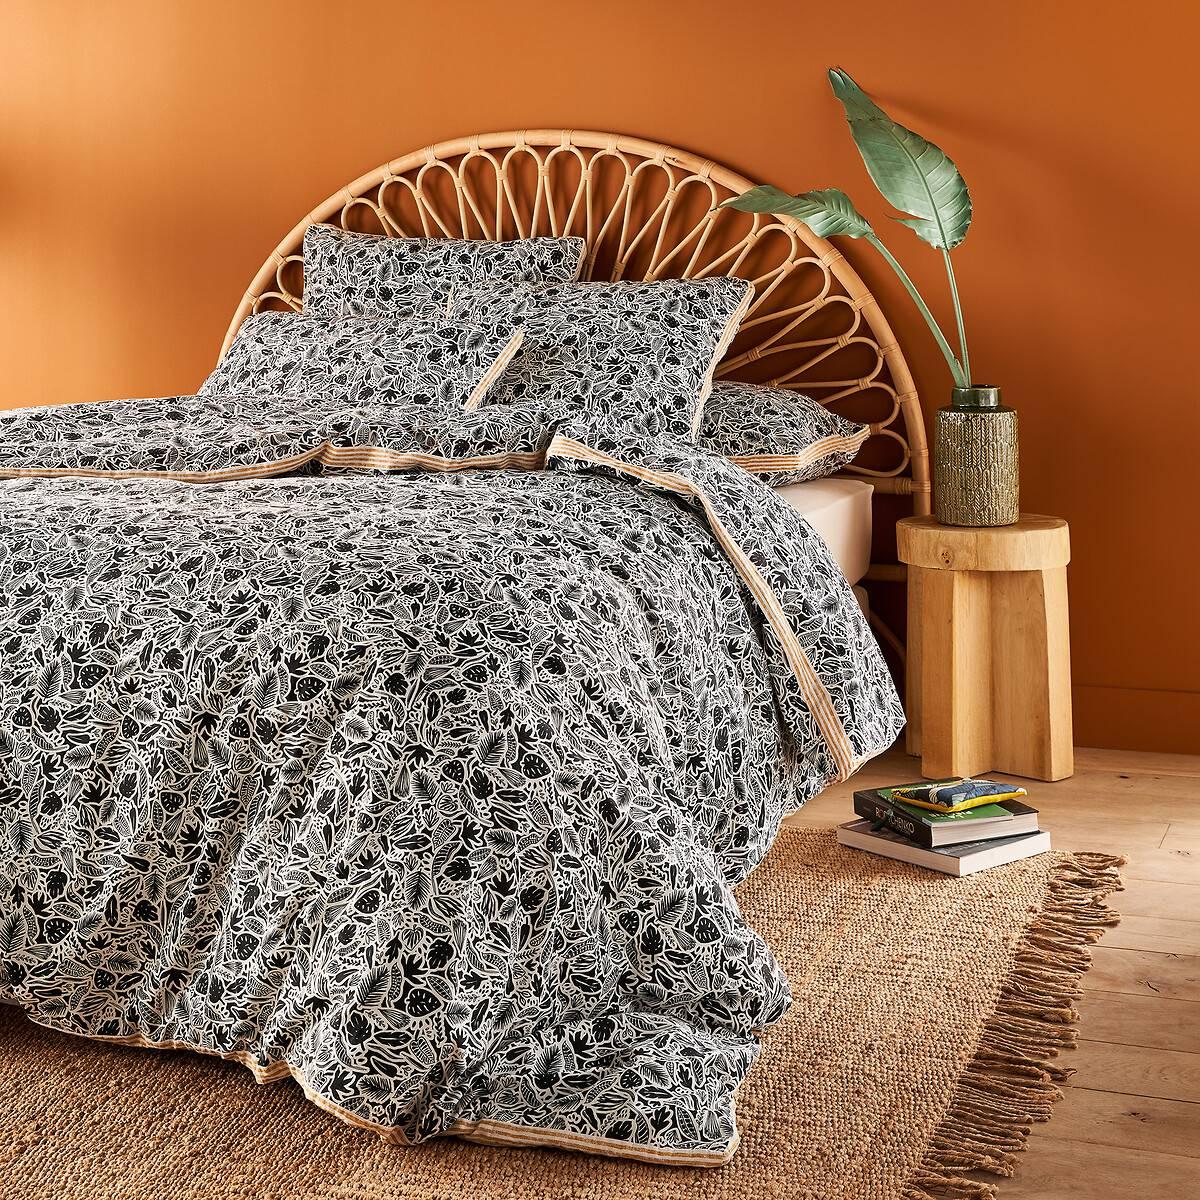 Funda nórdica 100% algodón lavado Palmolo